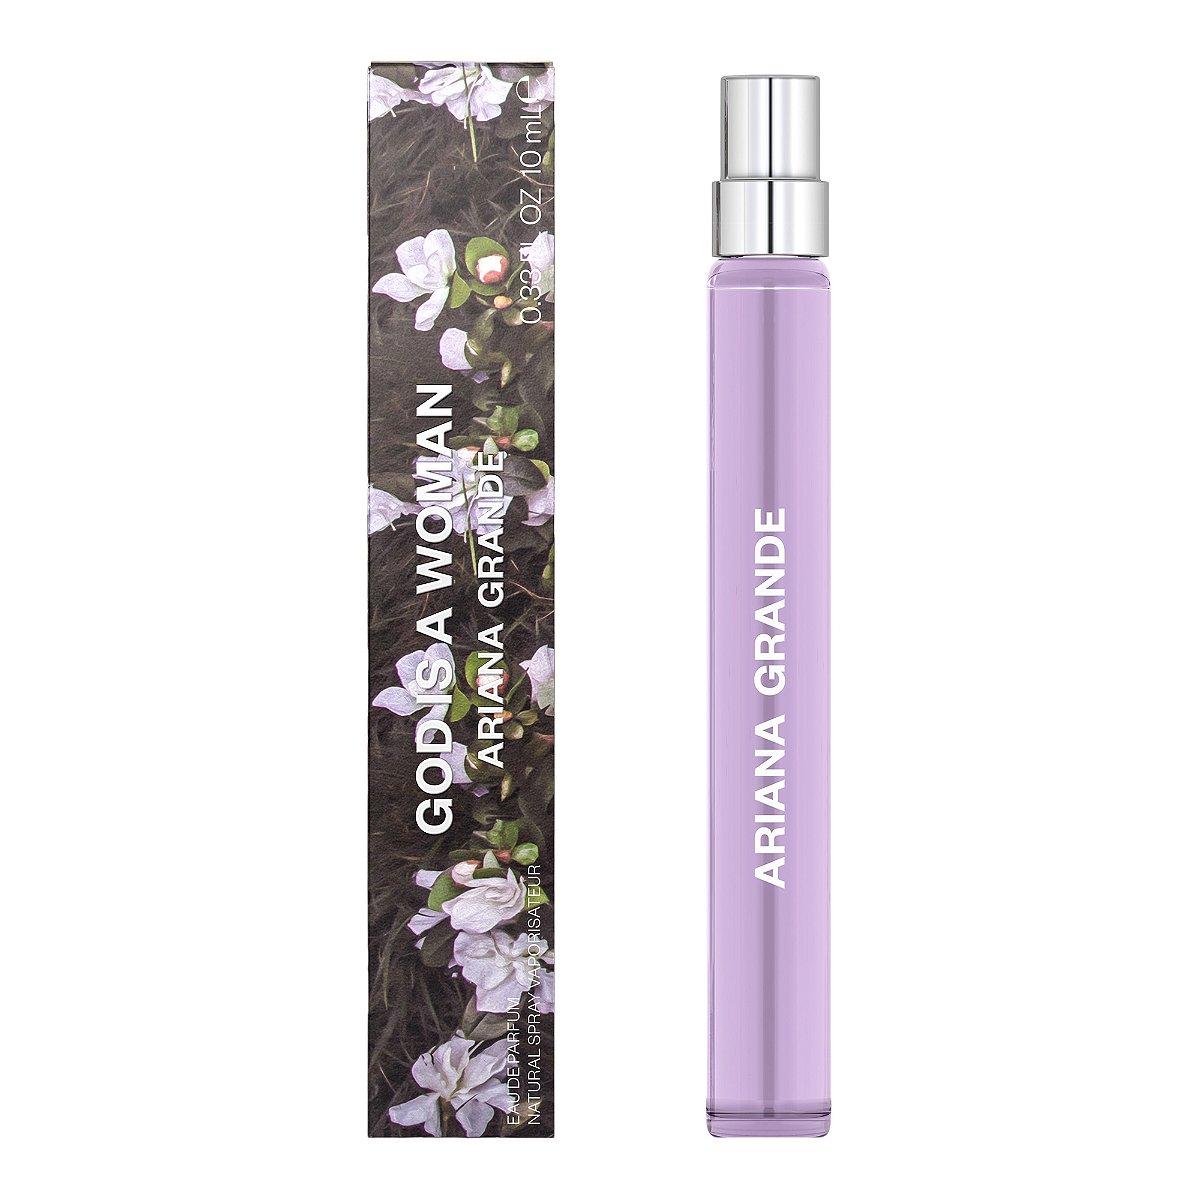 Ariana Grande God Is A Woman Eau de Parfum